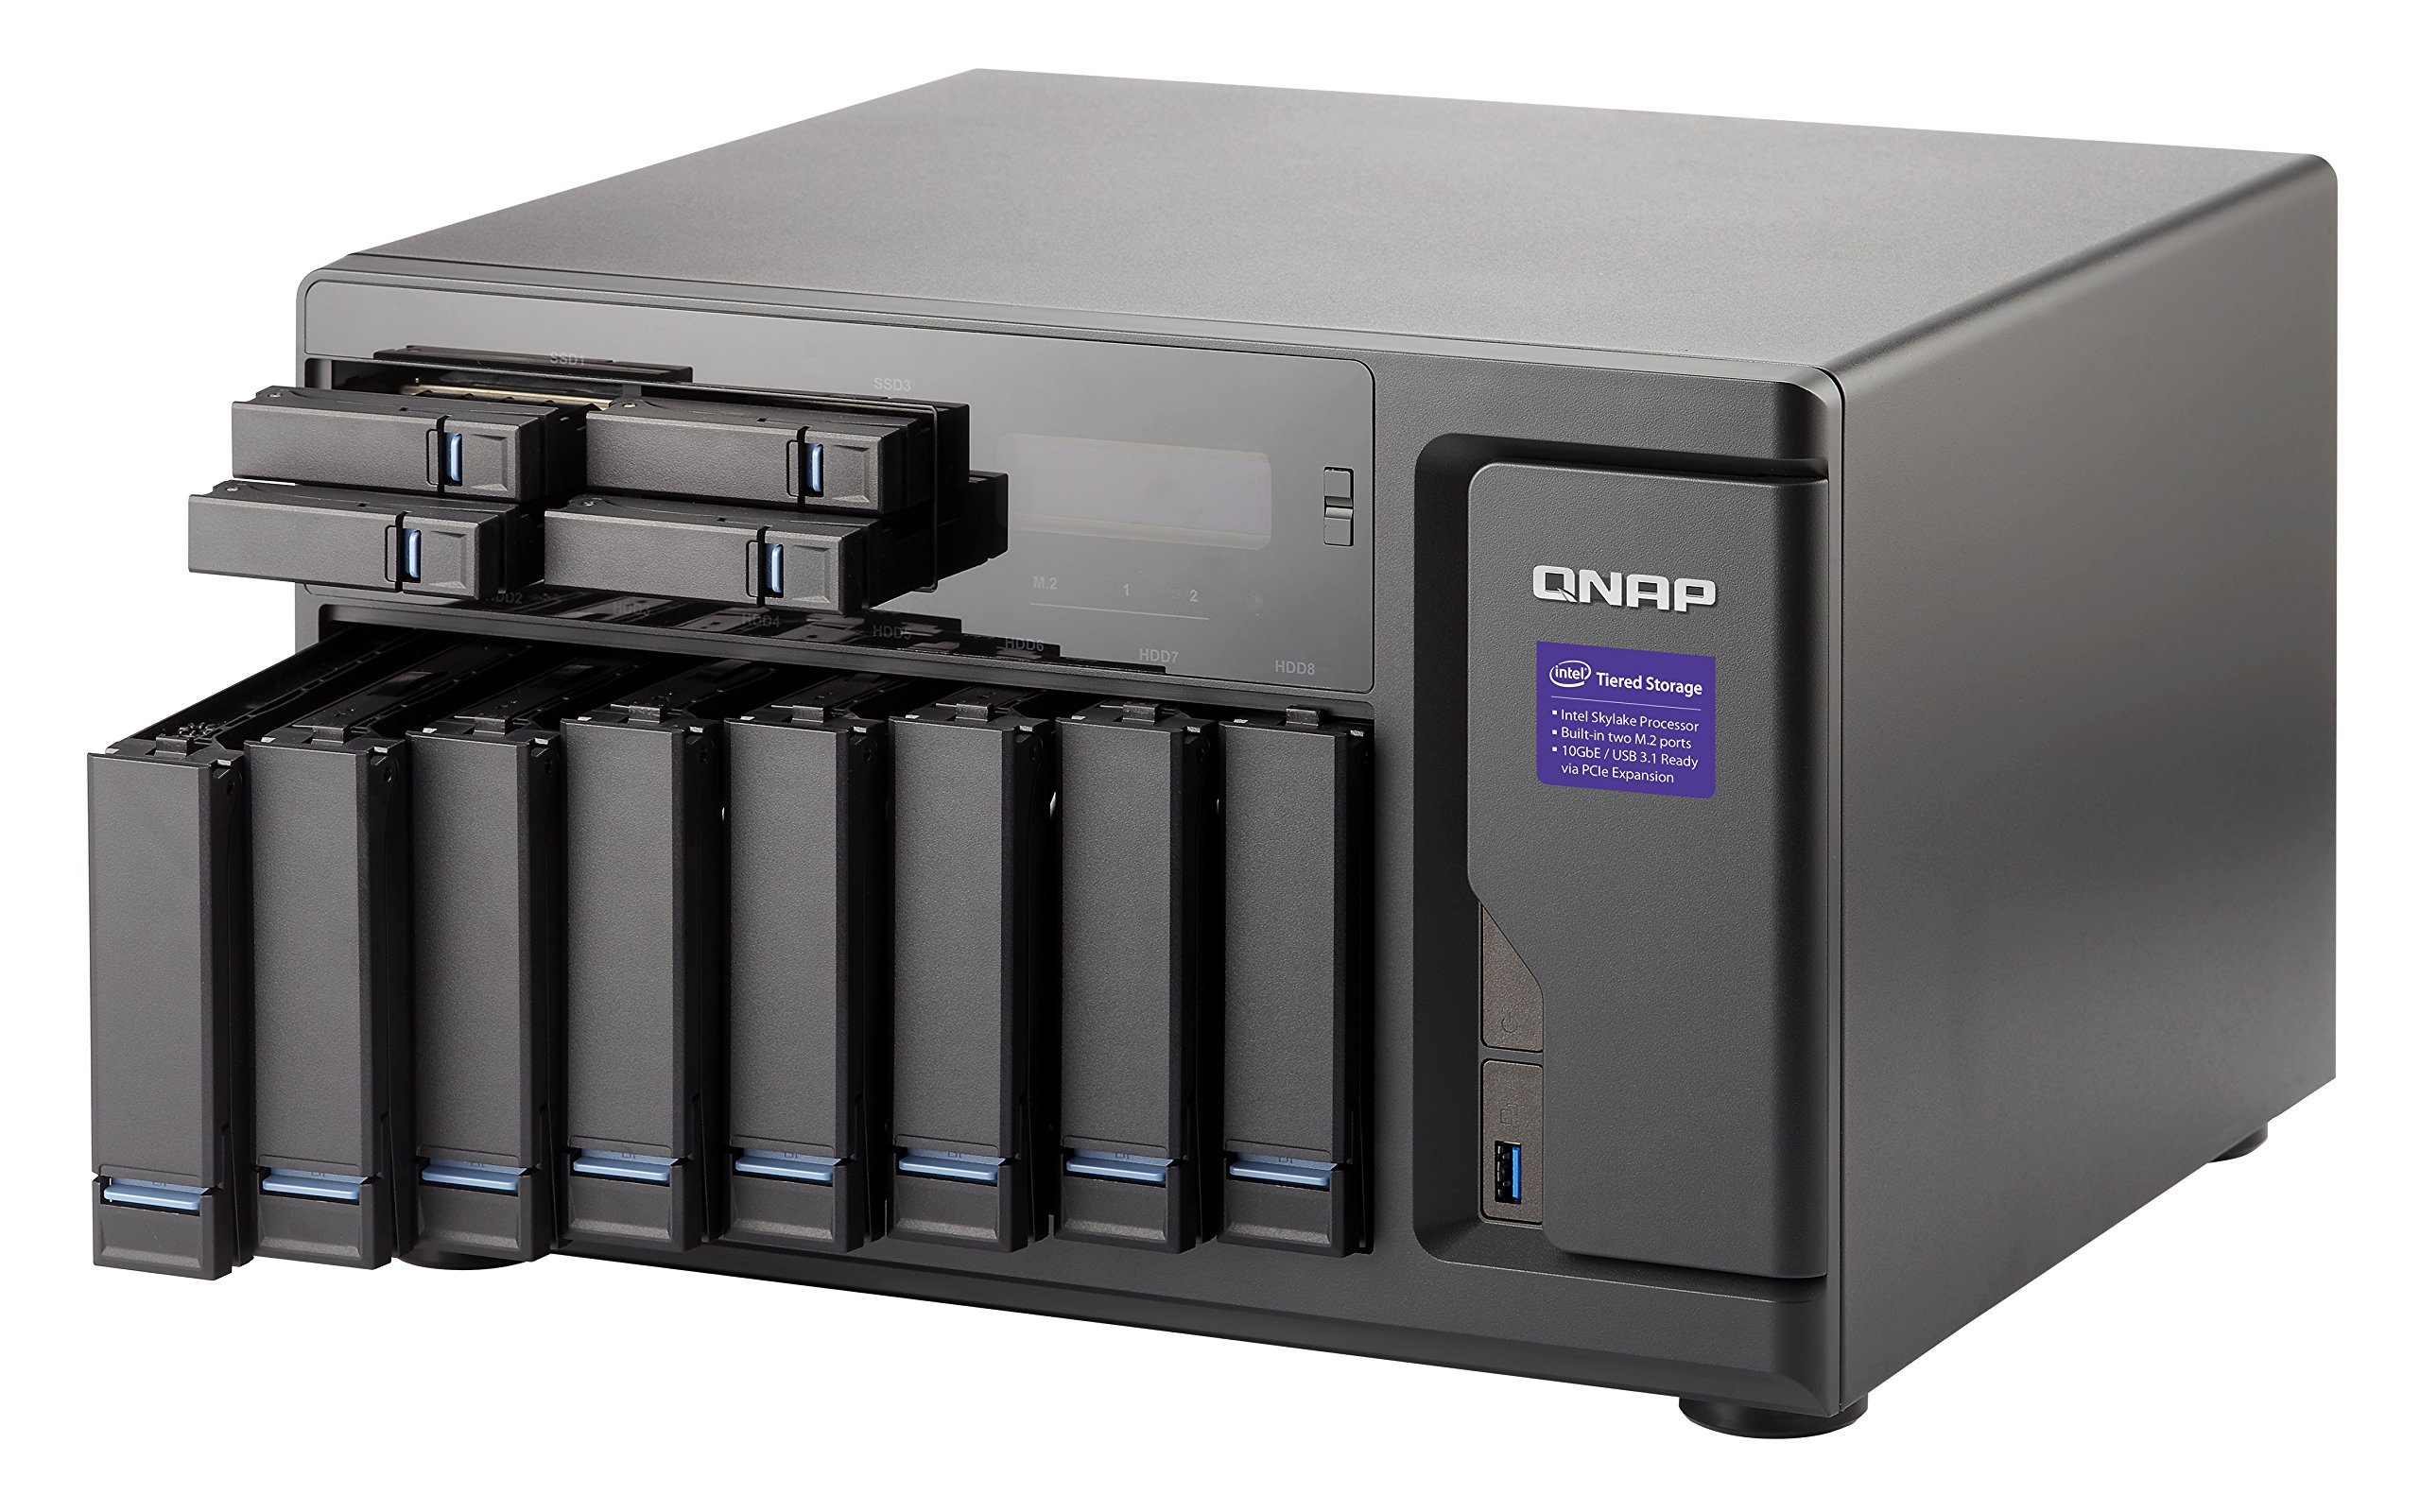 Qnap TVS-1282-i7-64G-US High Performance 12 bay (8+4) NAS/iSCSI IP-SAN, Intel Skylake Core i7-6700 3.4 GHz Quad Core, 32GB RAM, 10G-ready by QNAP (Image #2)